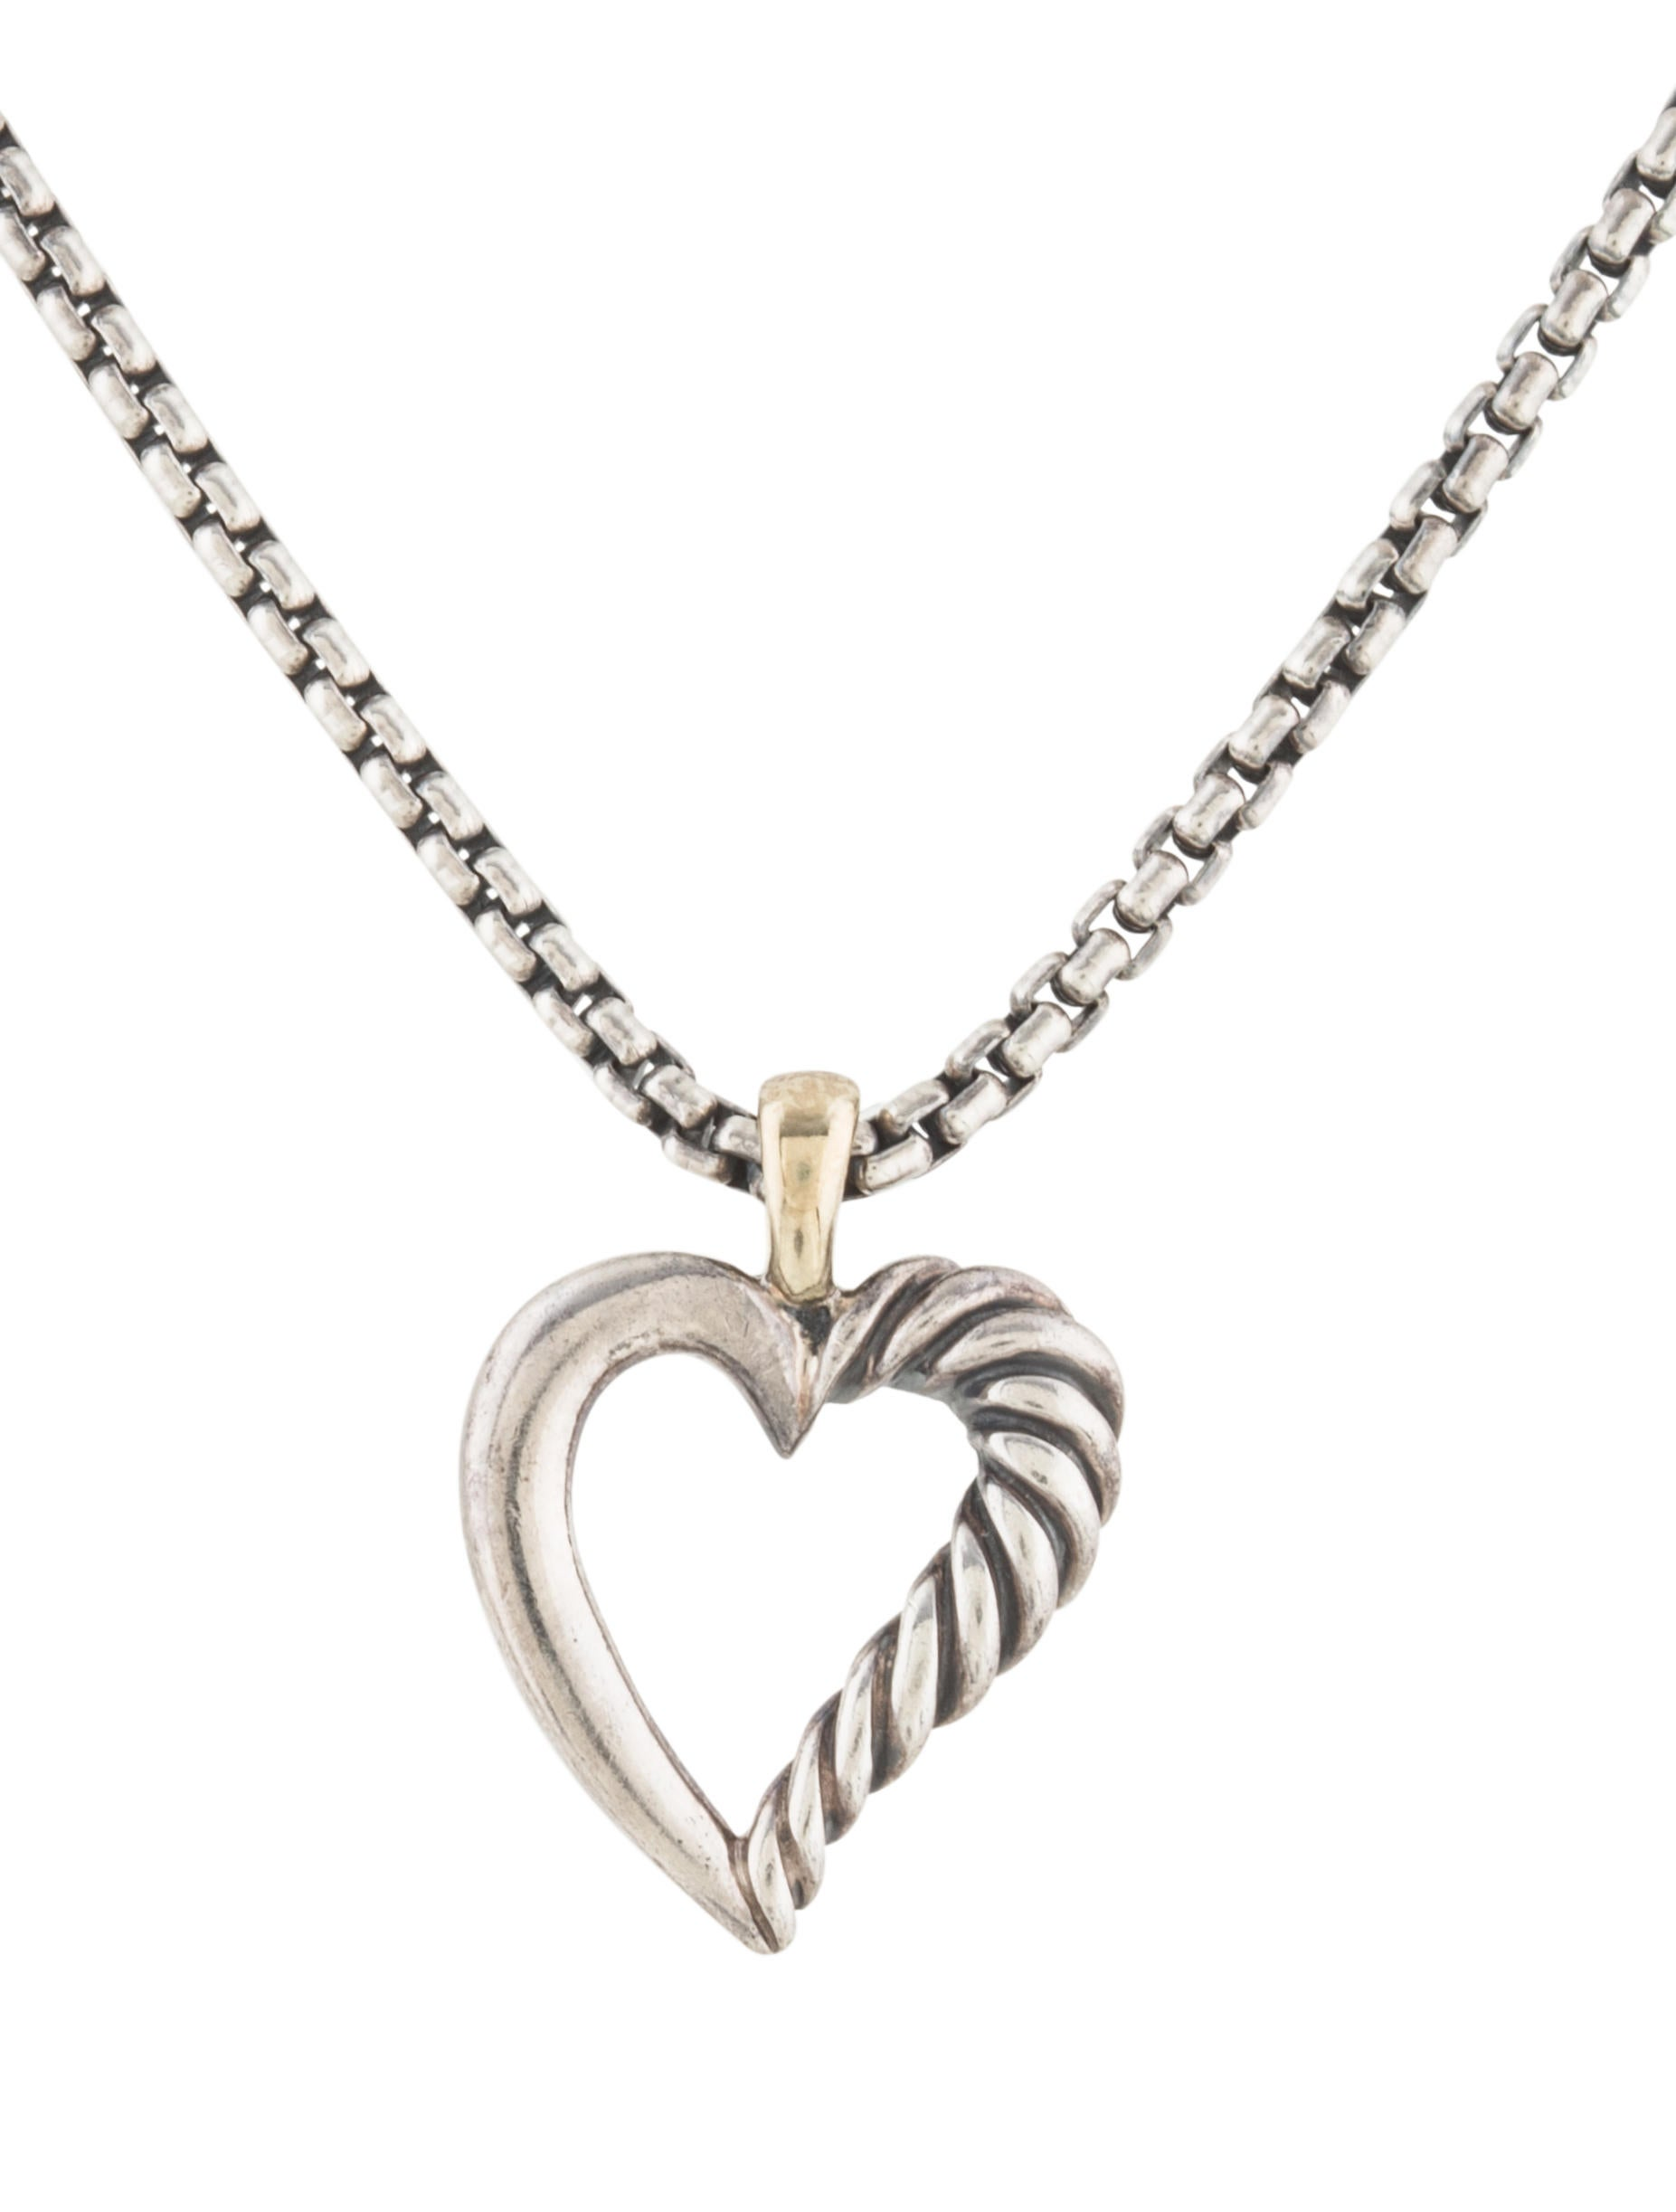 david yurman mini cable heart pendant necklace necklaces. Black Bedroom Furniture Sets. Home Design Ideas